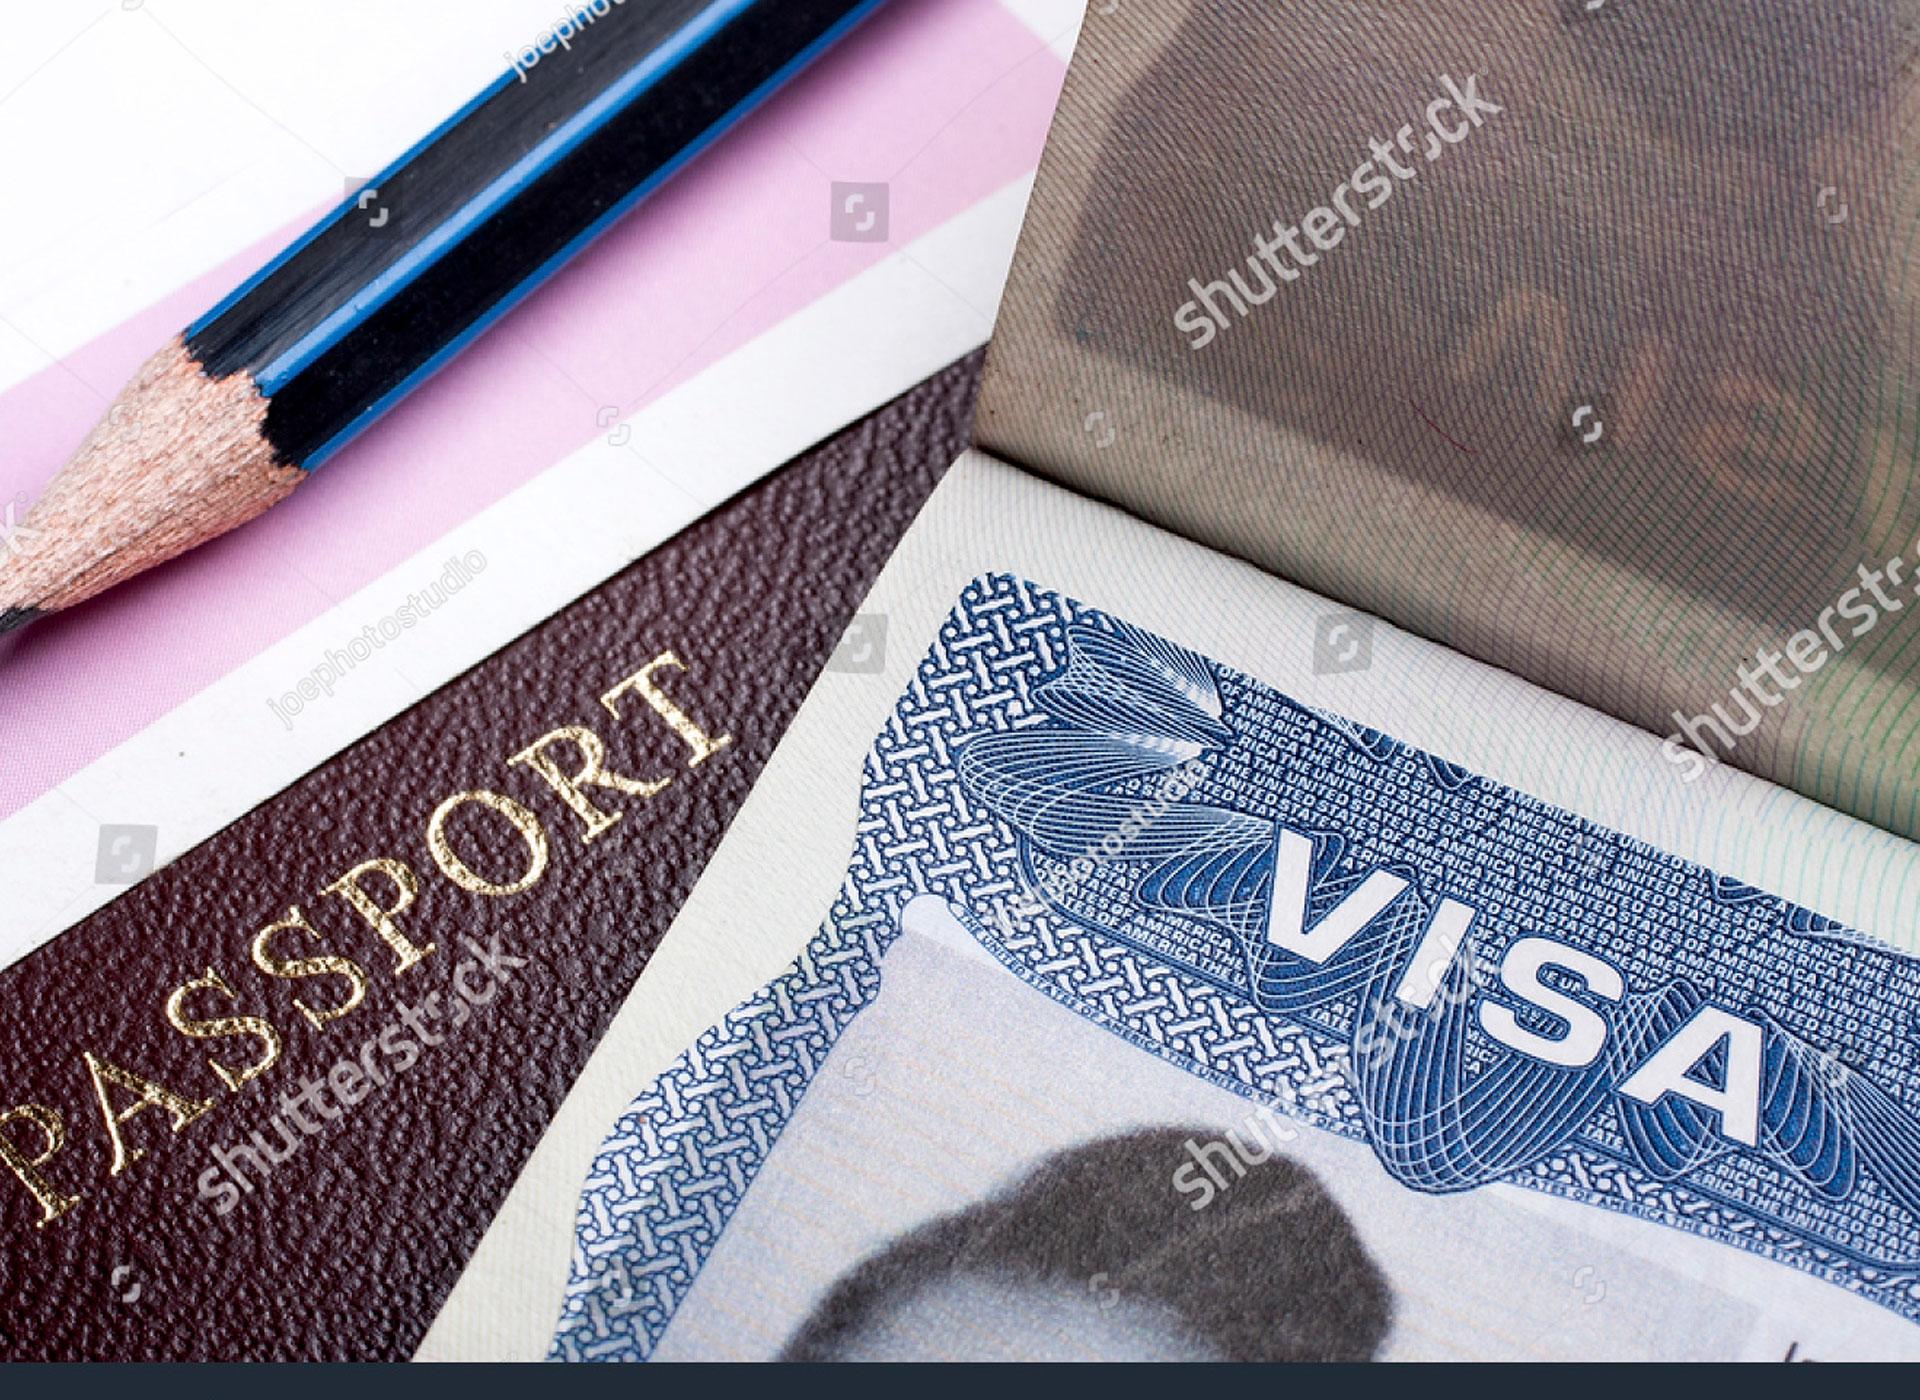 https://unixperts.com/wp-content/uploads/2021/07/aus-visa.jpg